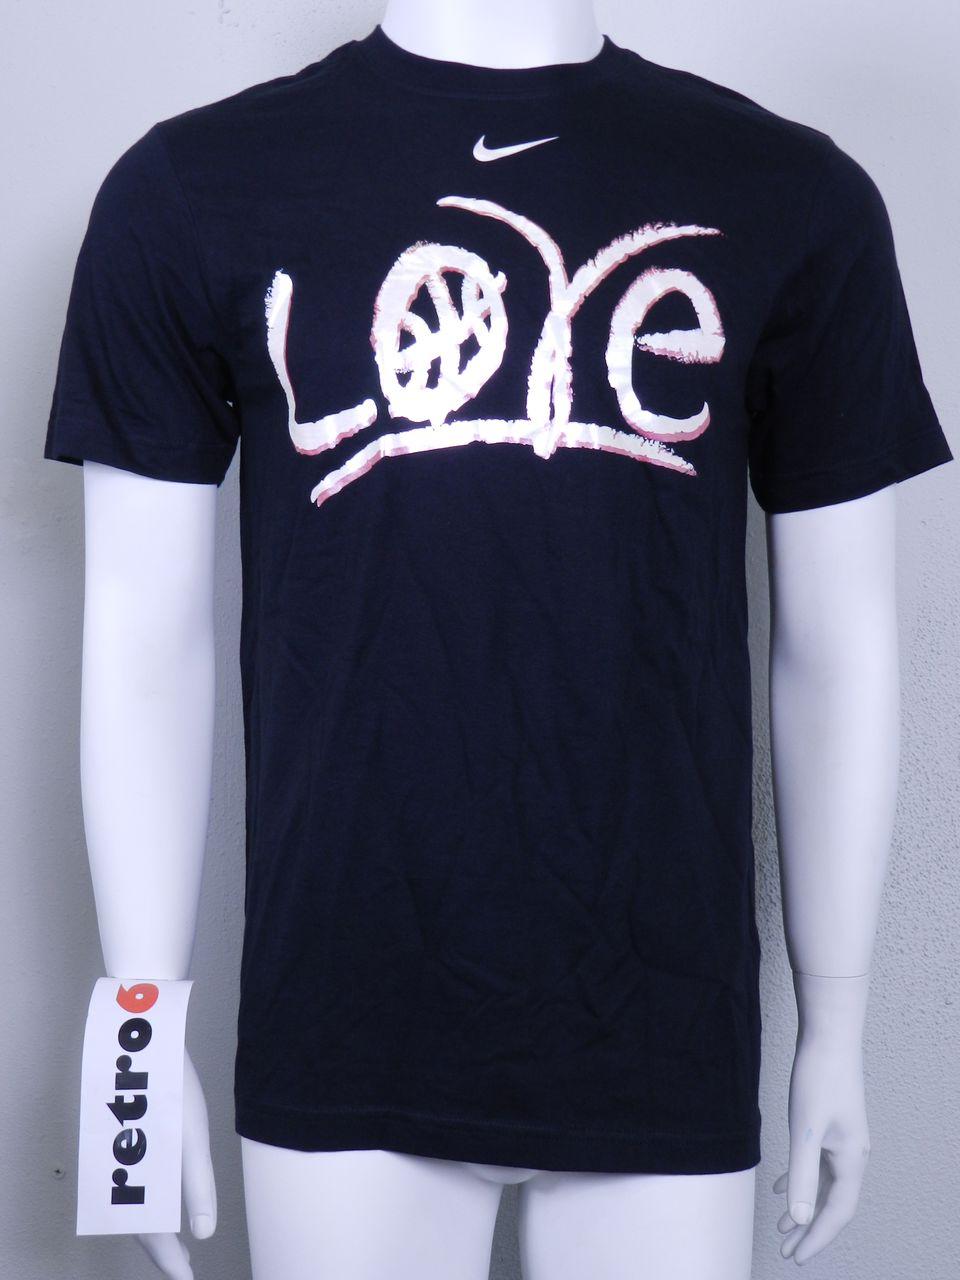 finest selection 1d9f5 e0ec3 Nike Kay YOW Breast Cancer New Mens Black Basketball T Shirt 406052